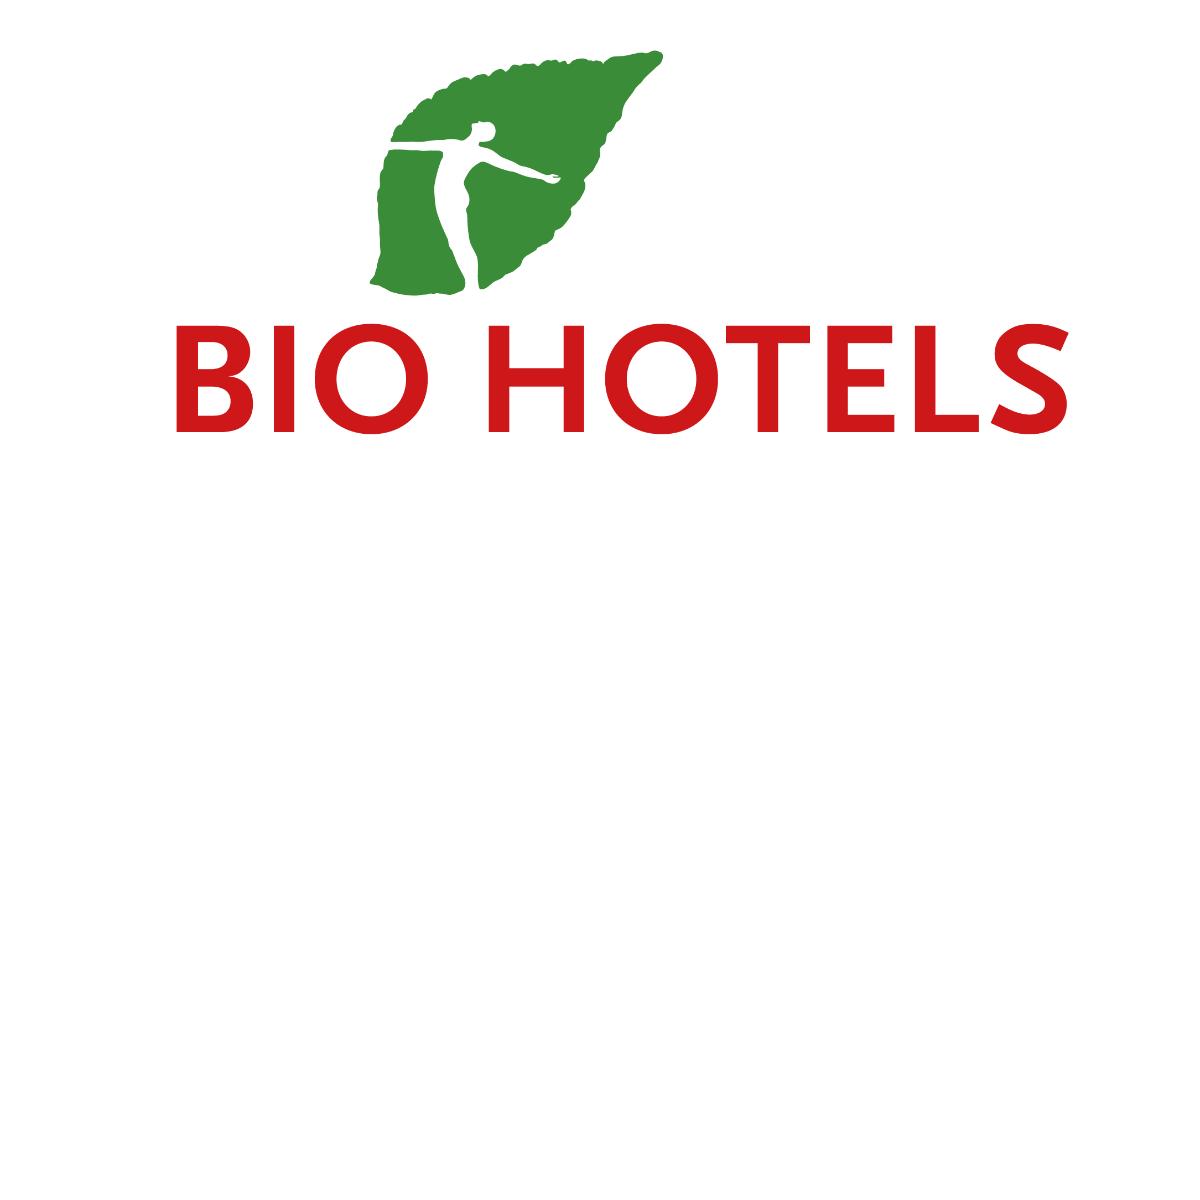 BIO HOTELS